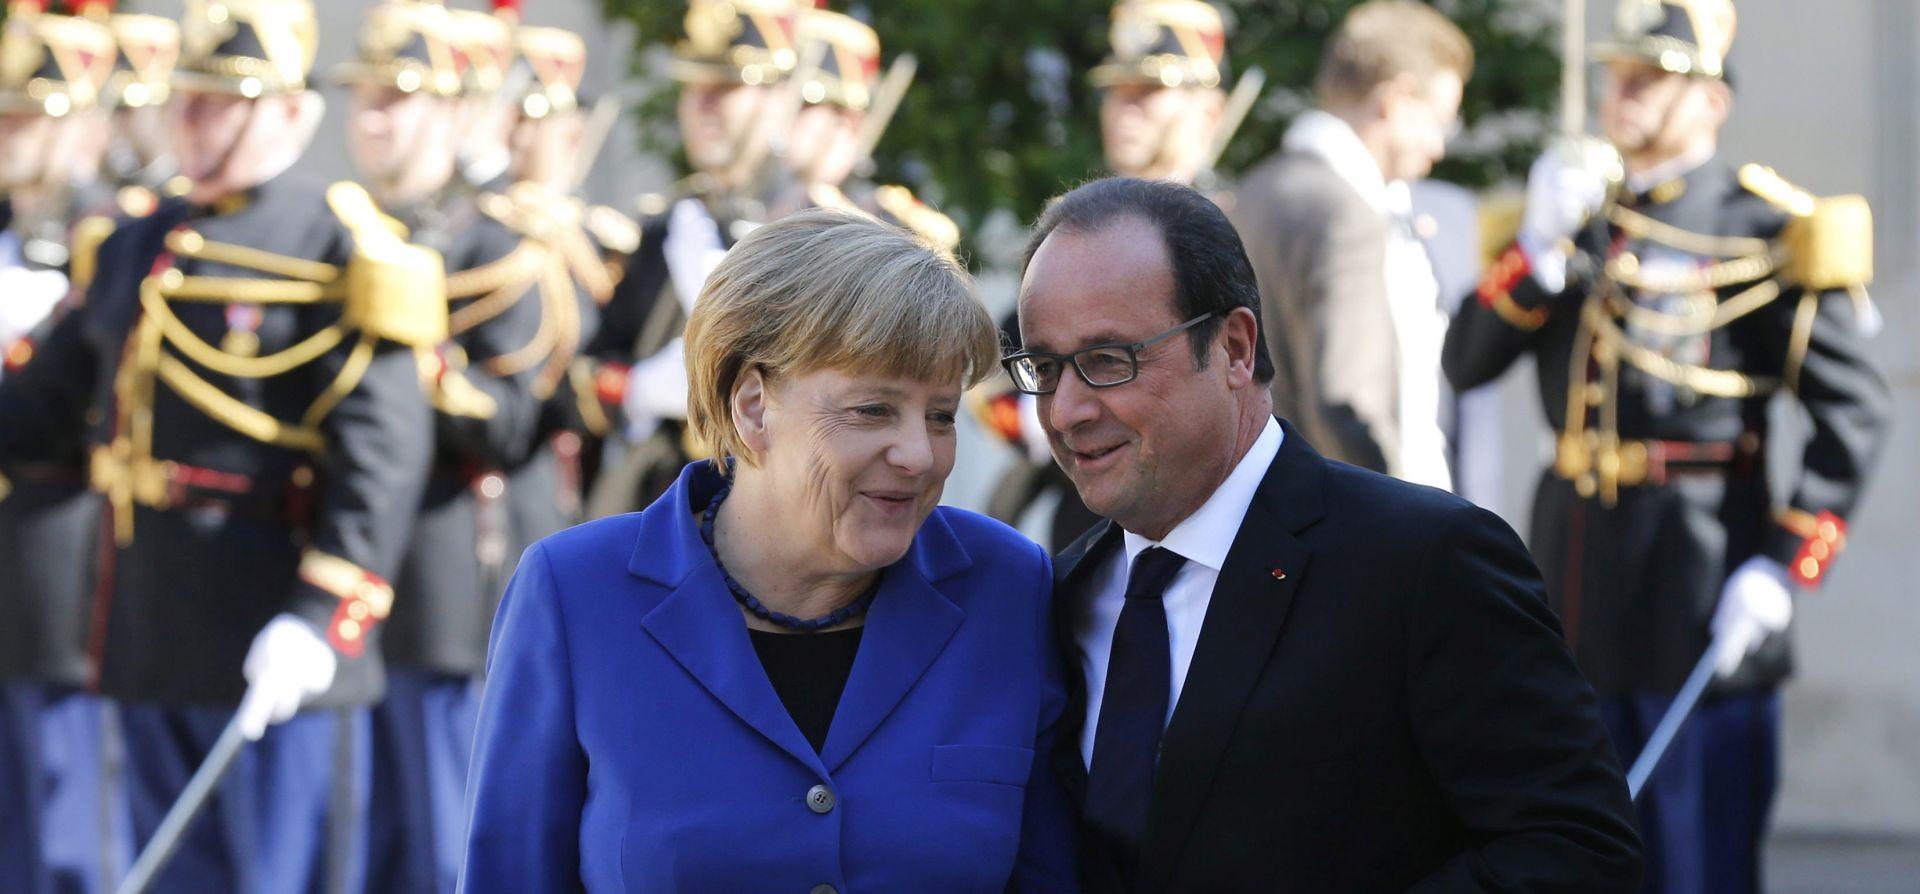 MERKEL STEŽE: Moramo zaštiti svoje vanjske granice diljem Europe